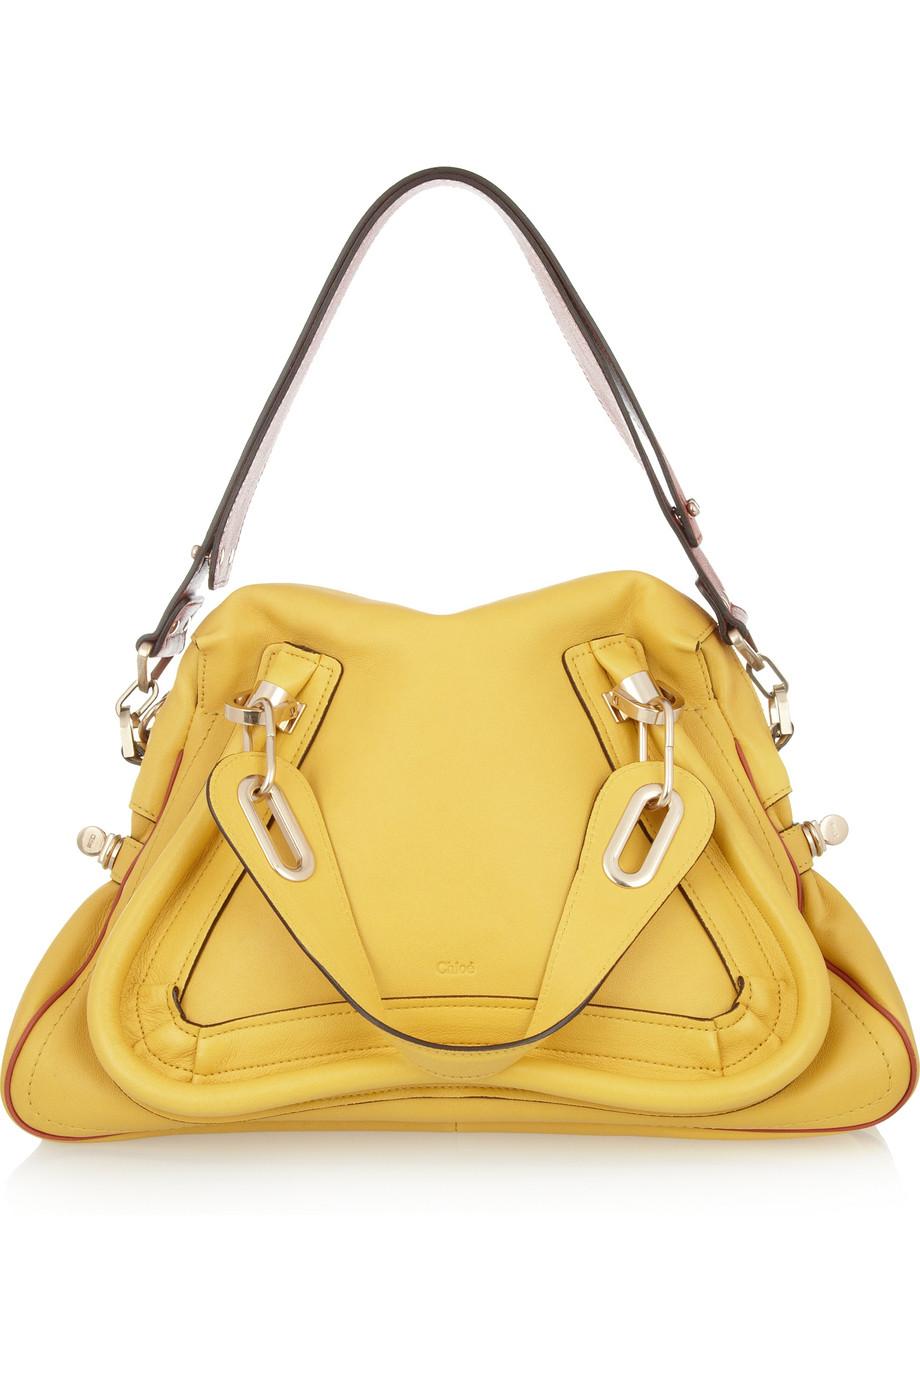 Chloe Angie Medium Leather Shoulder Bag 26